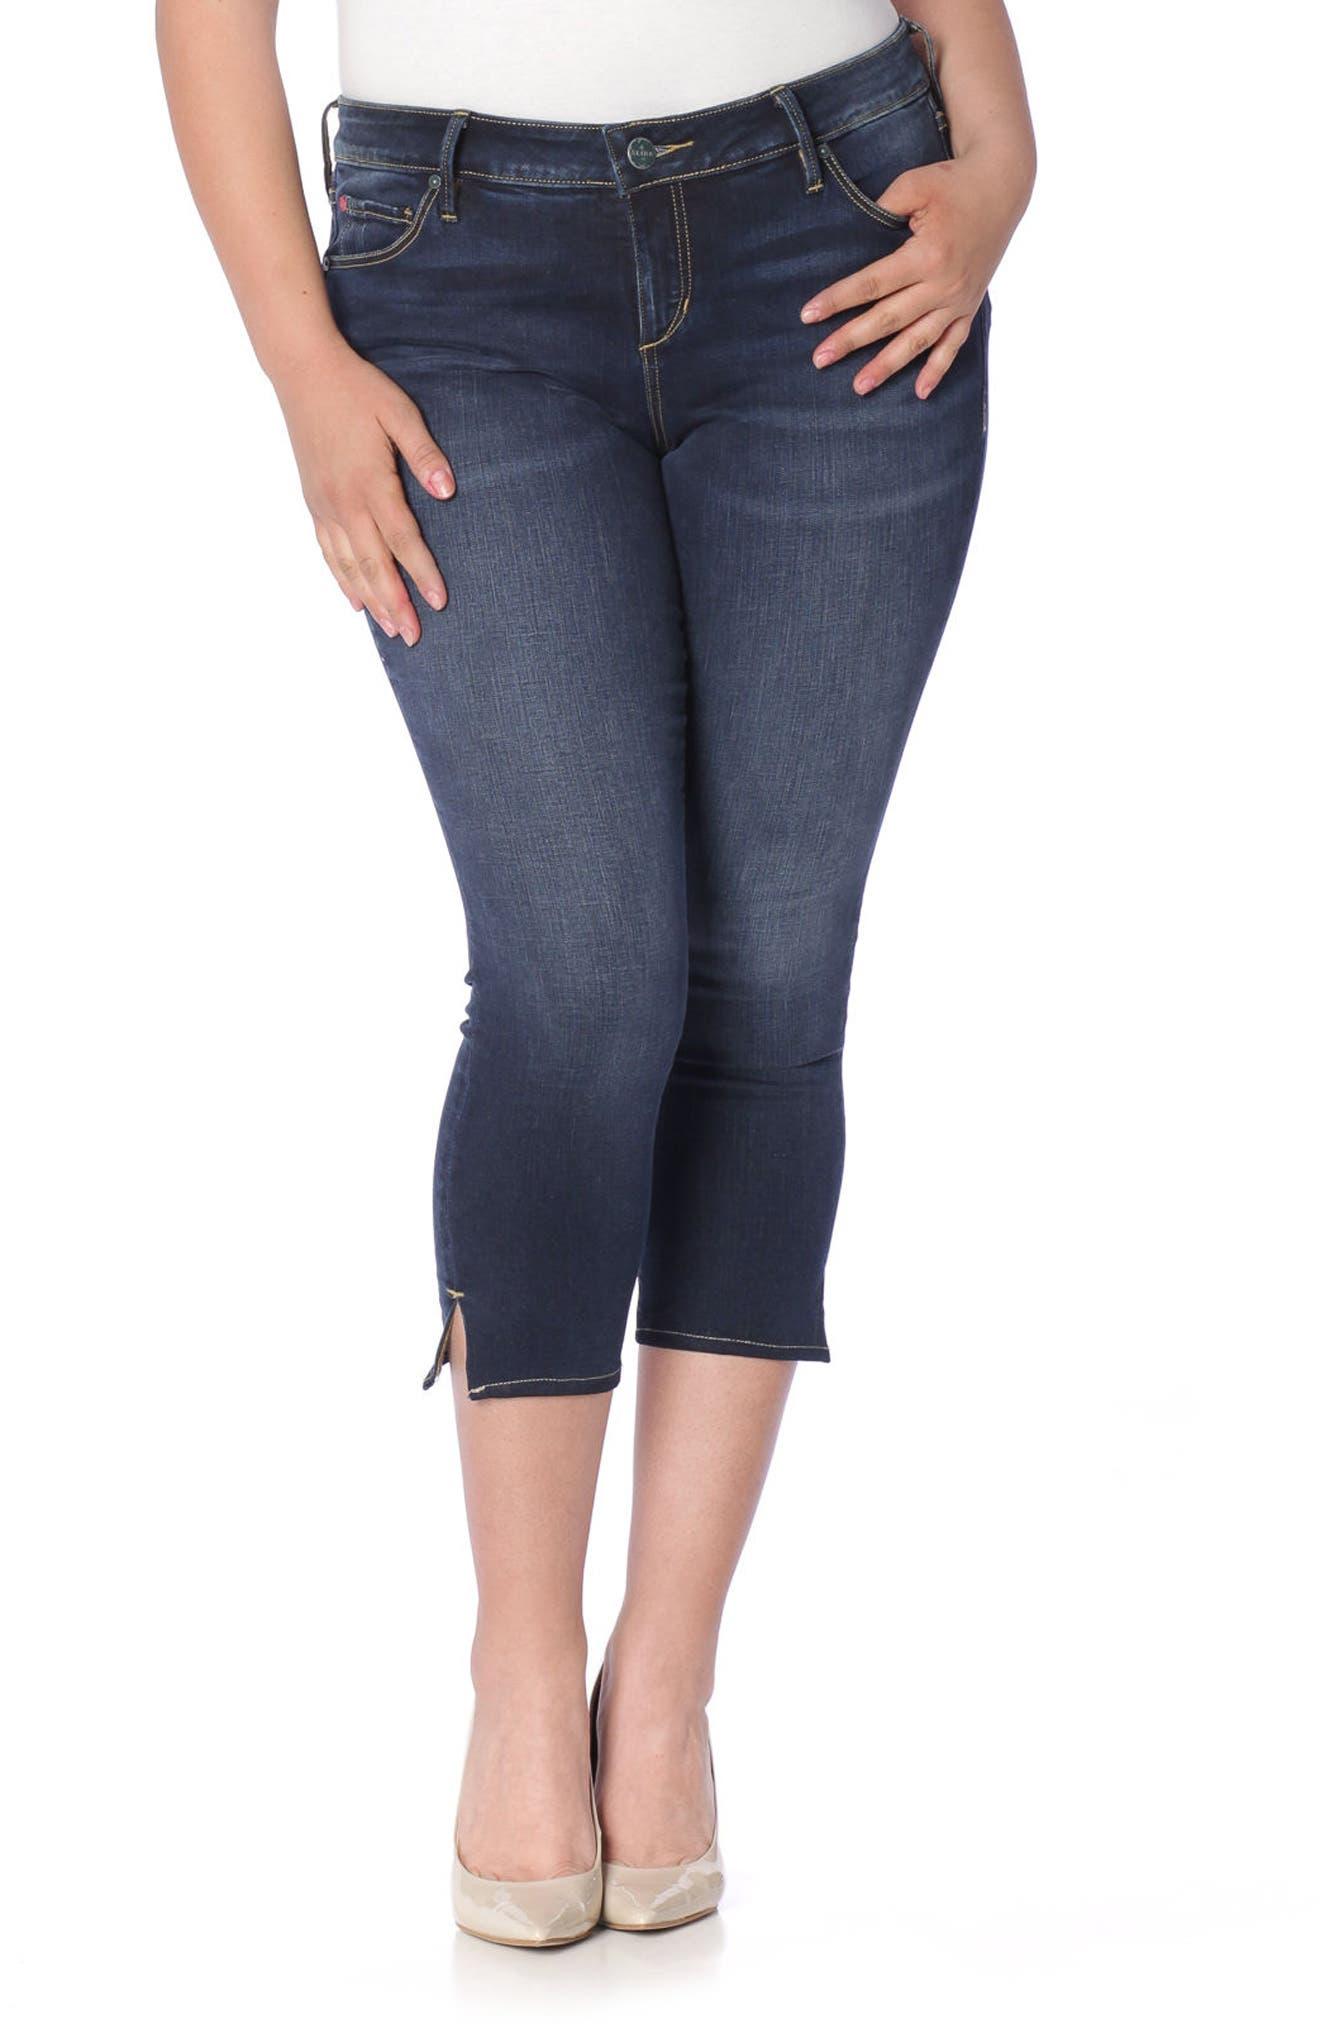 Main Image - SLINK Jeans Side Vent Crop Jeans (Amber) (Plus Size)